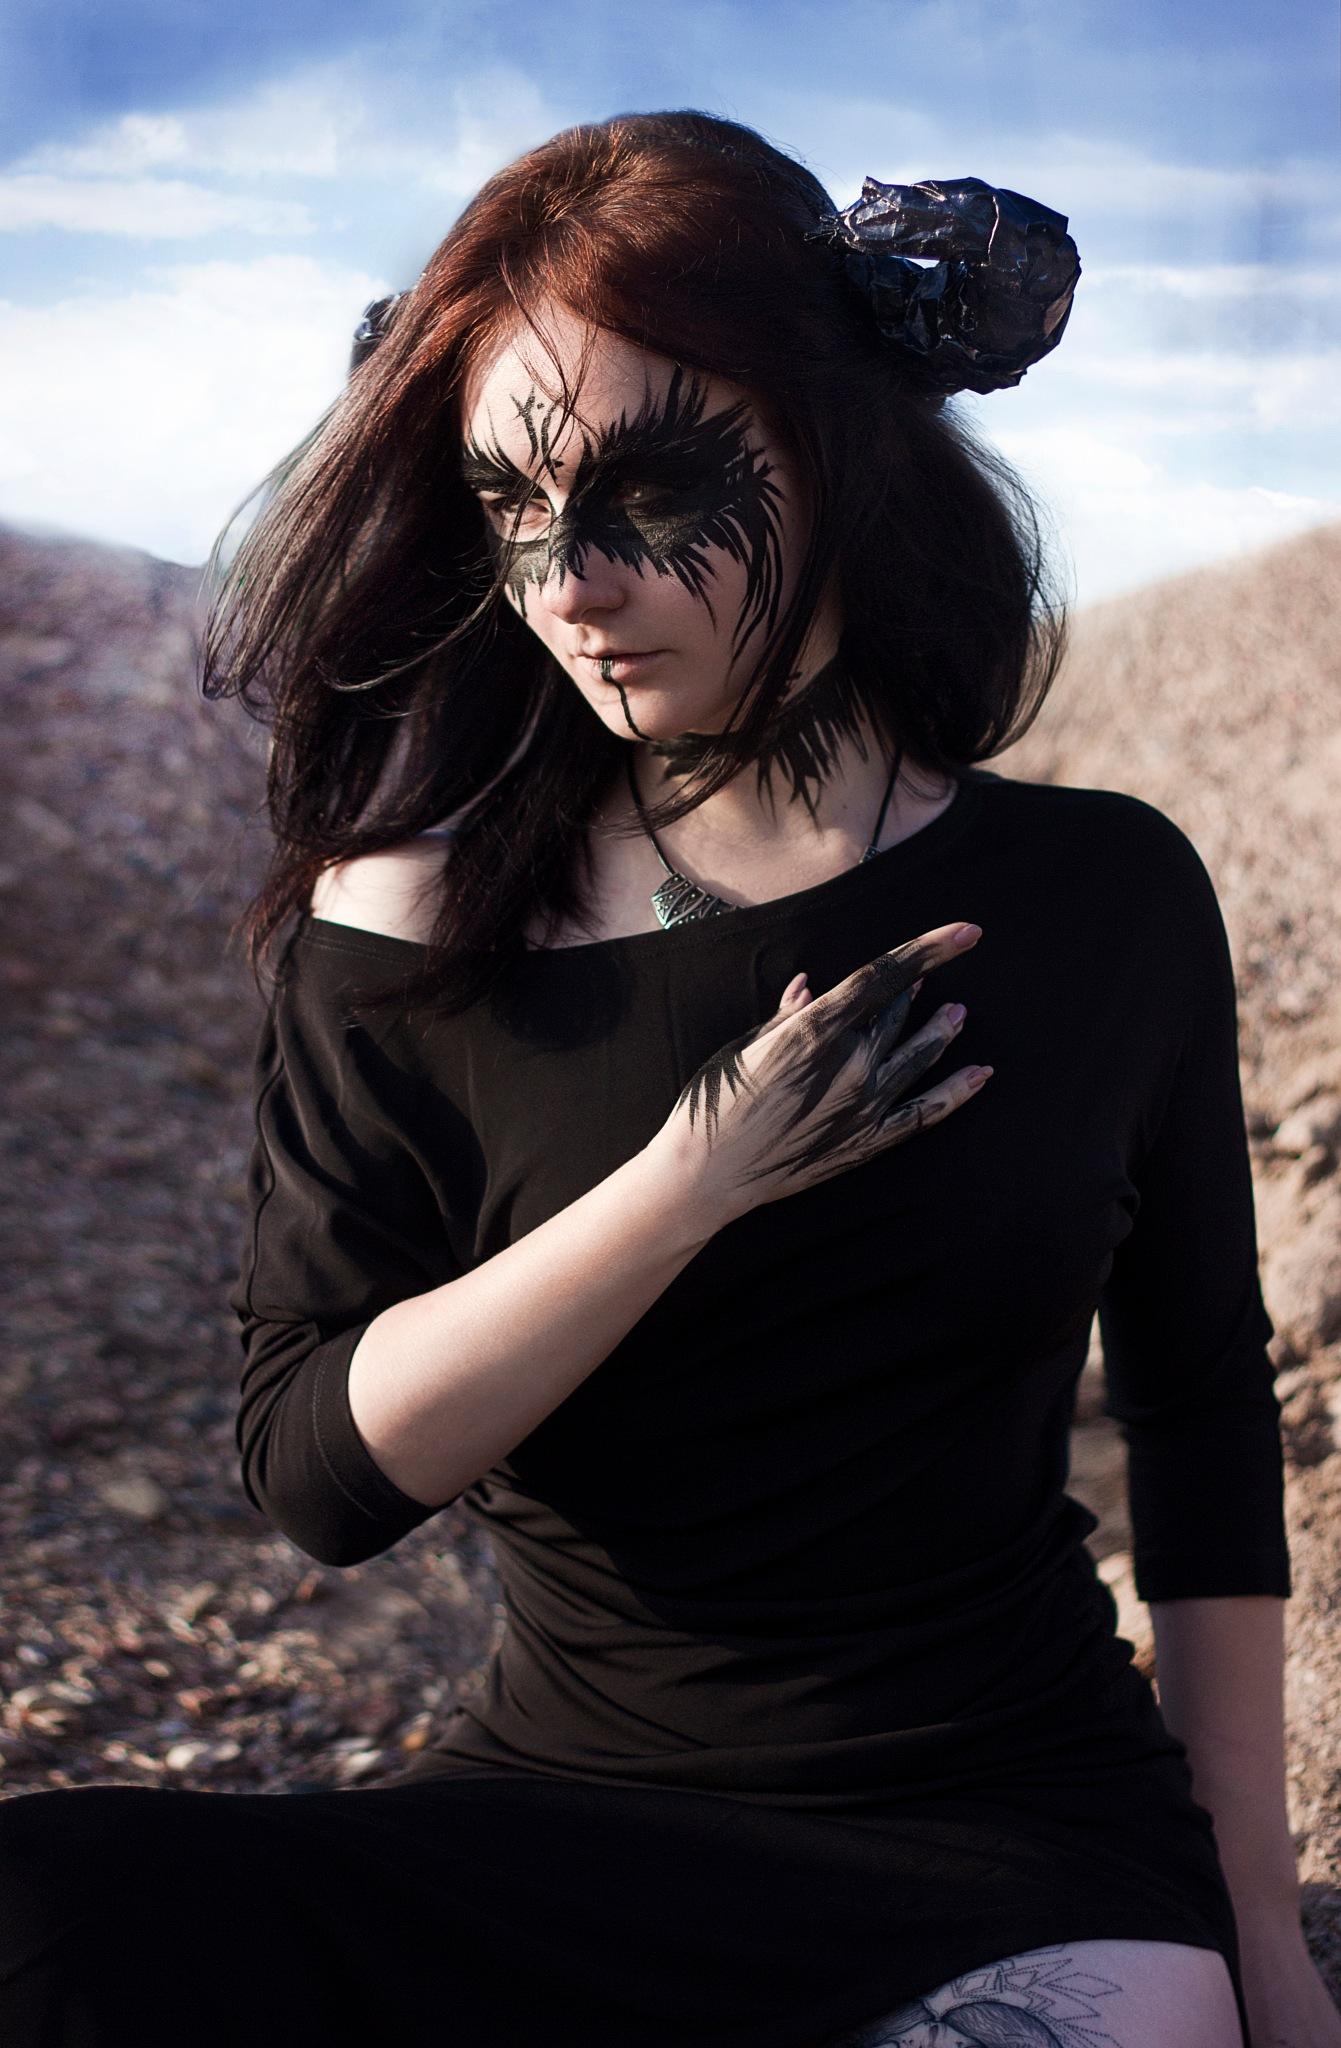 My Demon by zacarinnayanastya